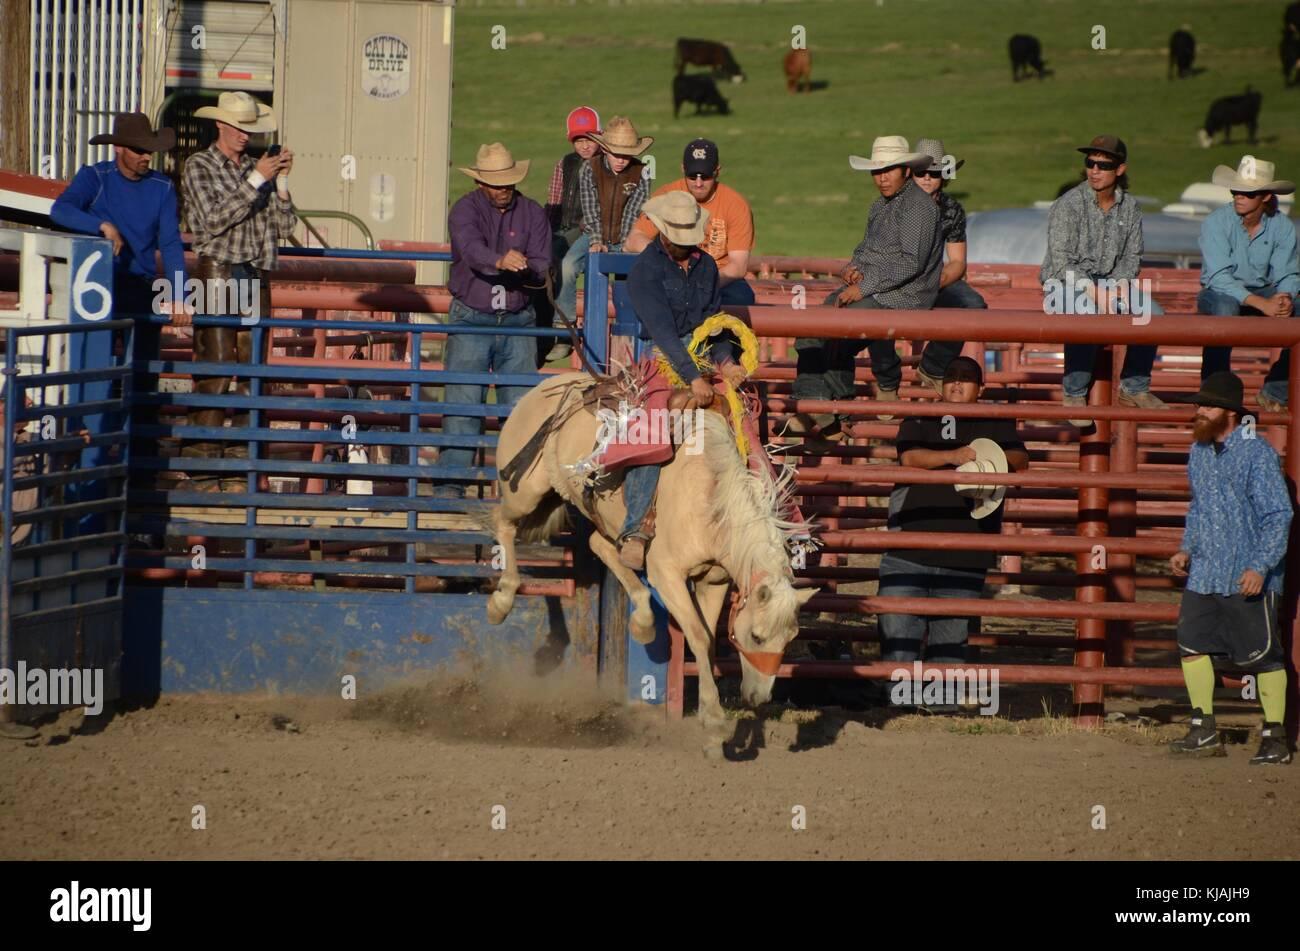 Cowboy Bull Rider Équitation Rodeo équipe Roundup T-Shirt Chemise